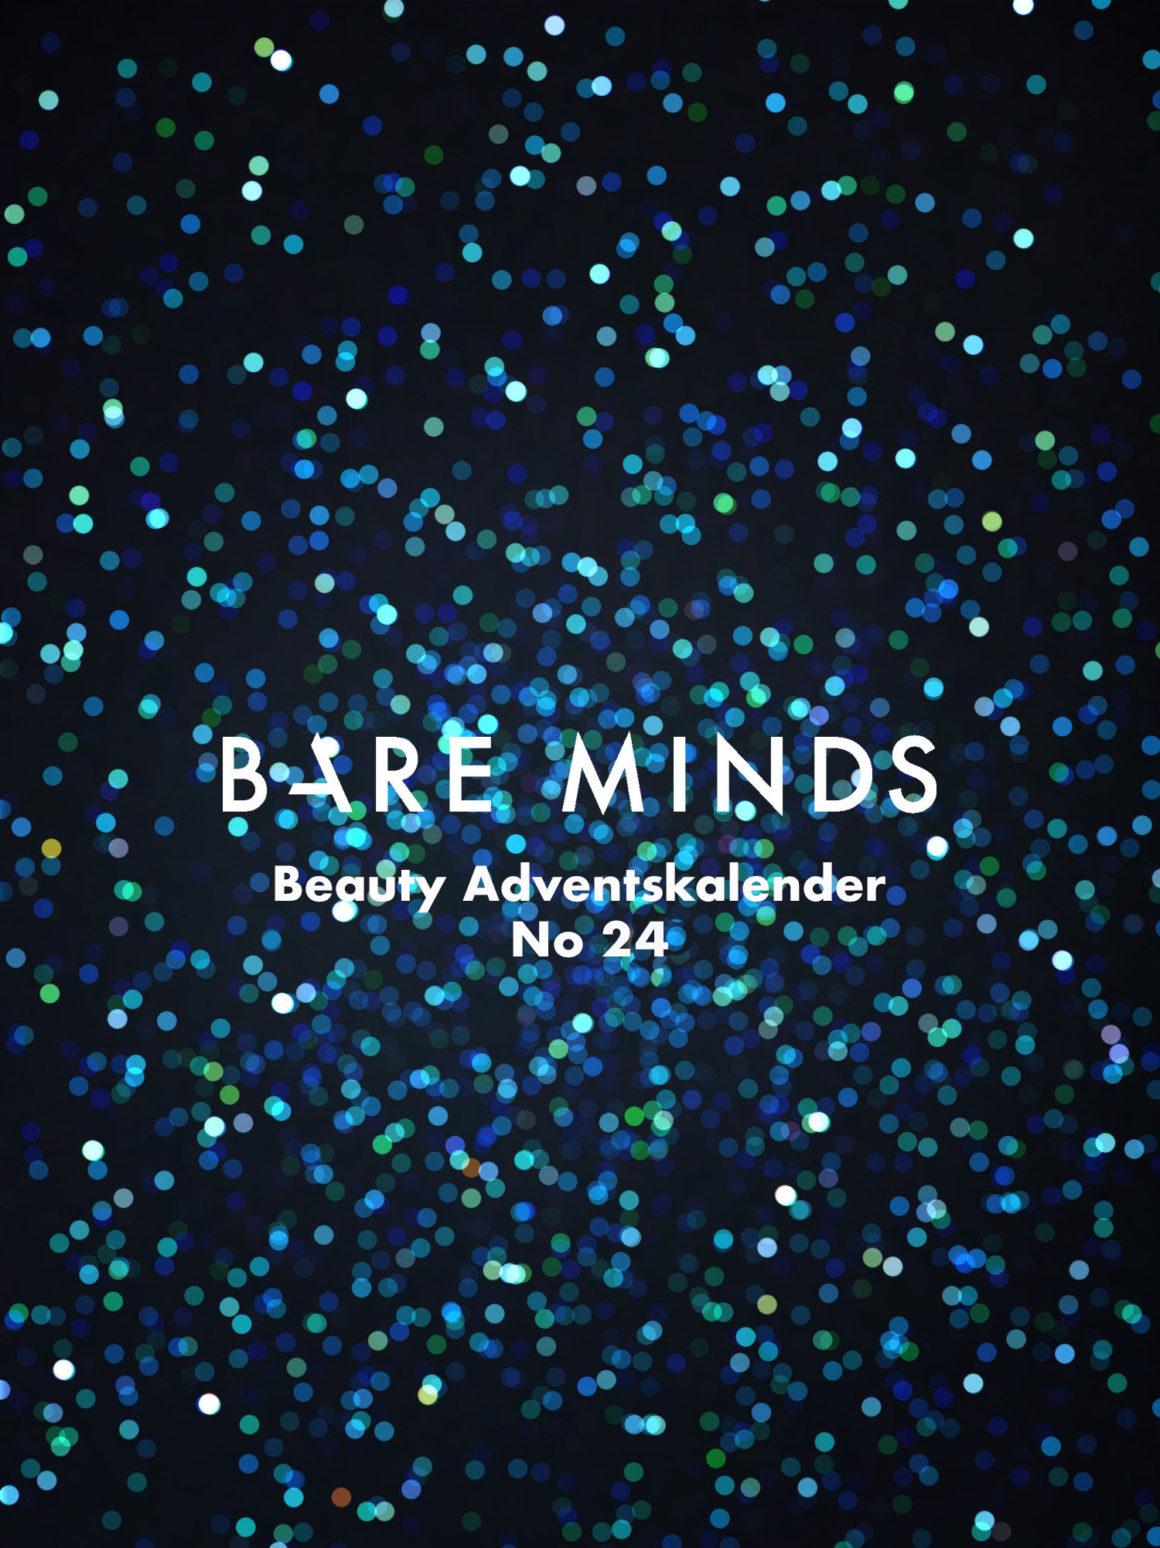 Bare Minds Beauty Adventskalender munmun-singh-758911-unsplash